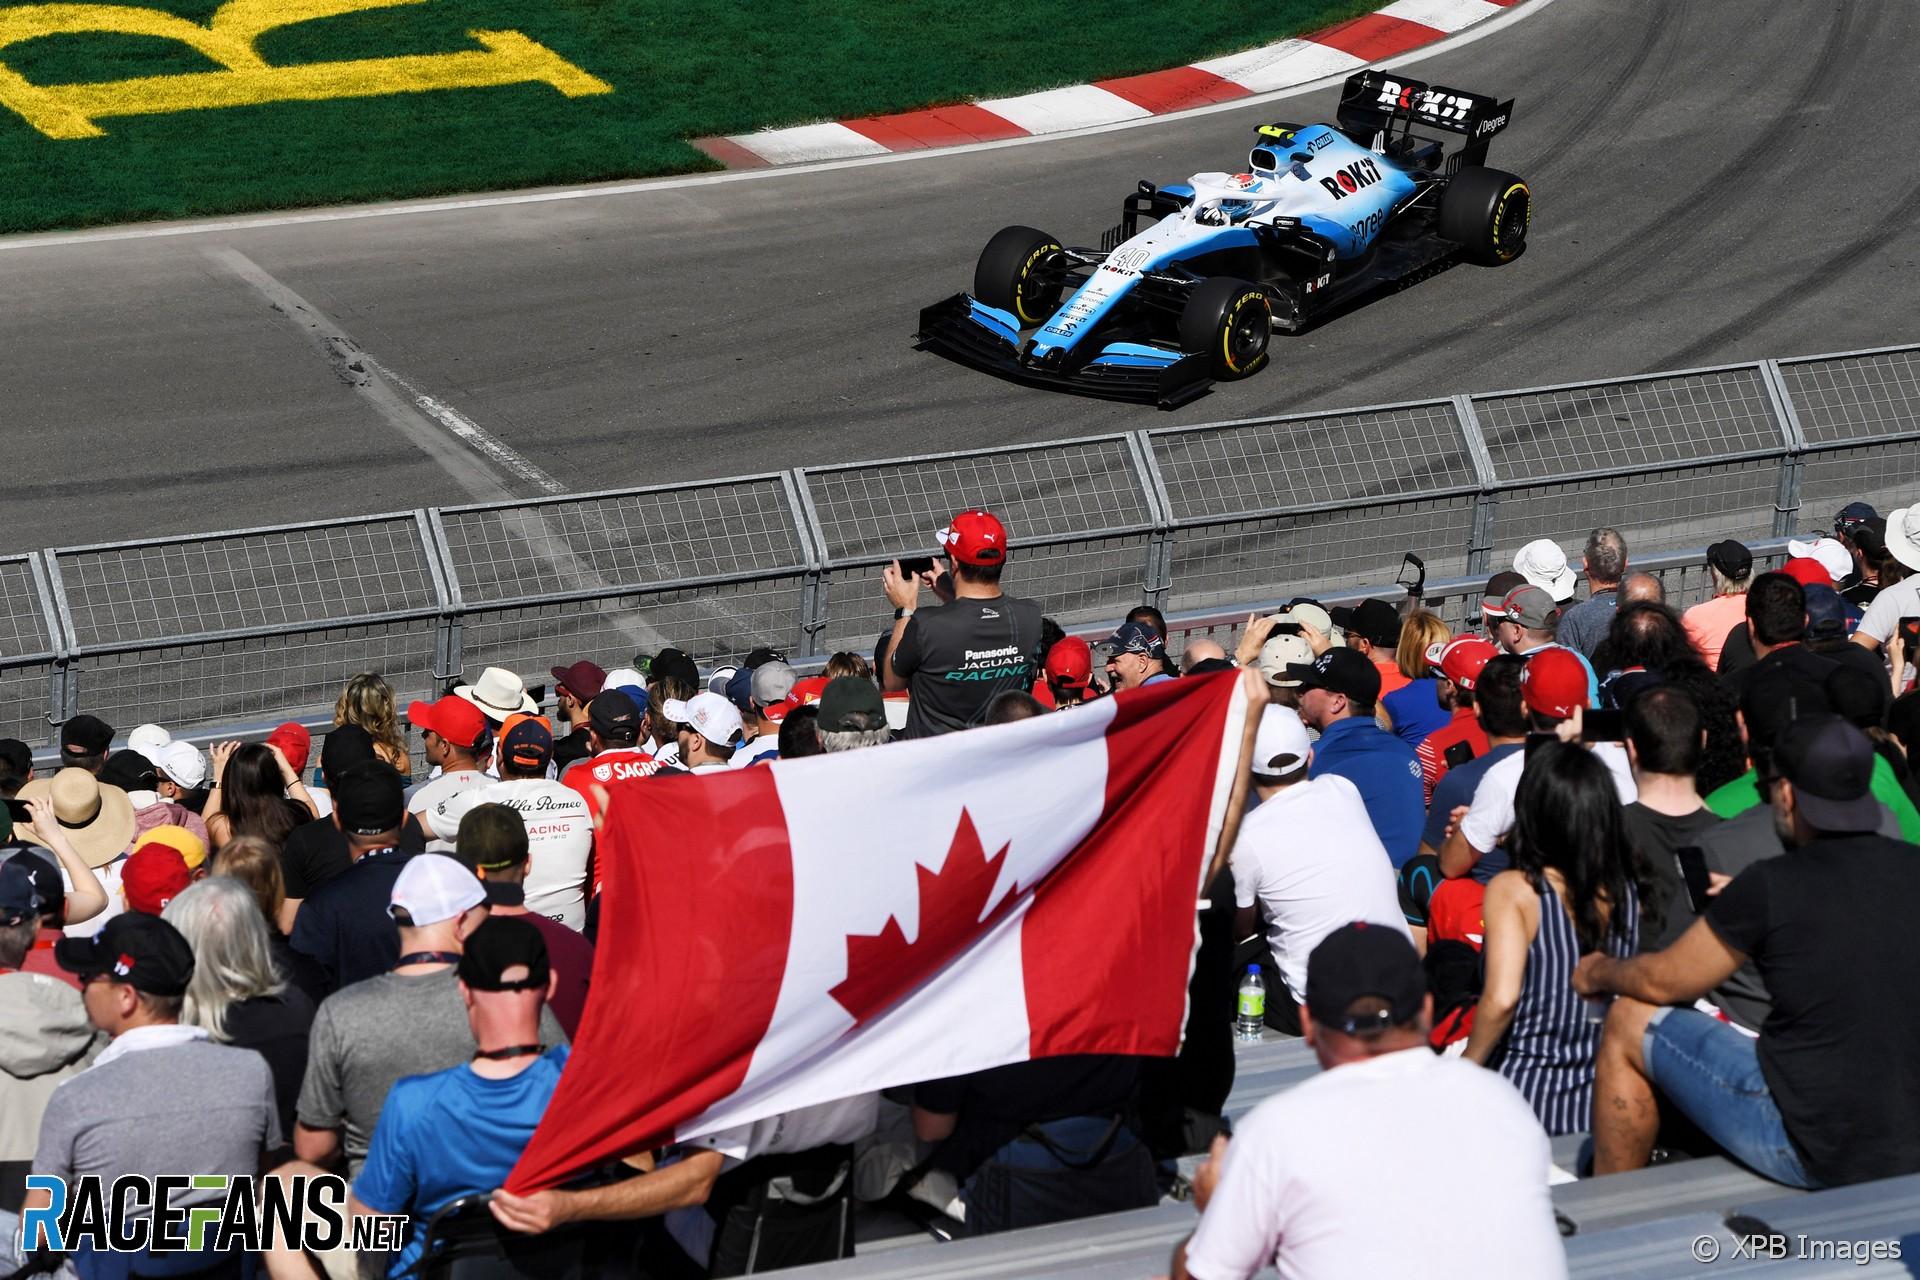 Nicholas Latifi, Williams, Circuit Gilles Villeneuve, 2019